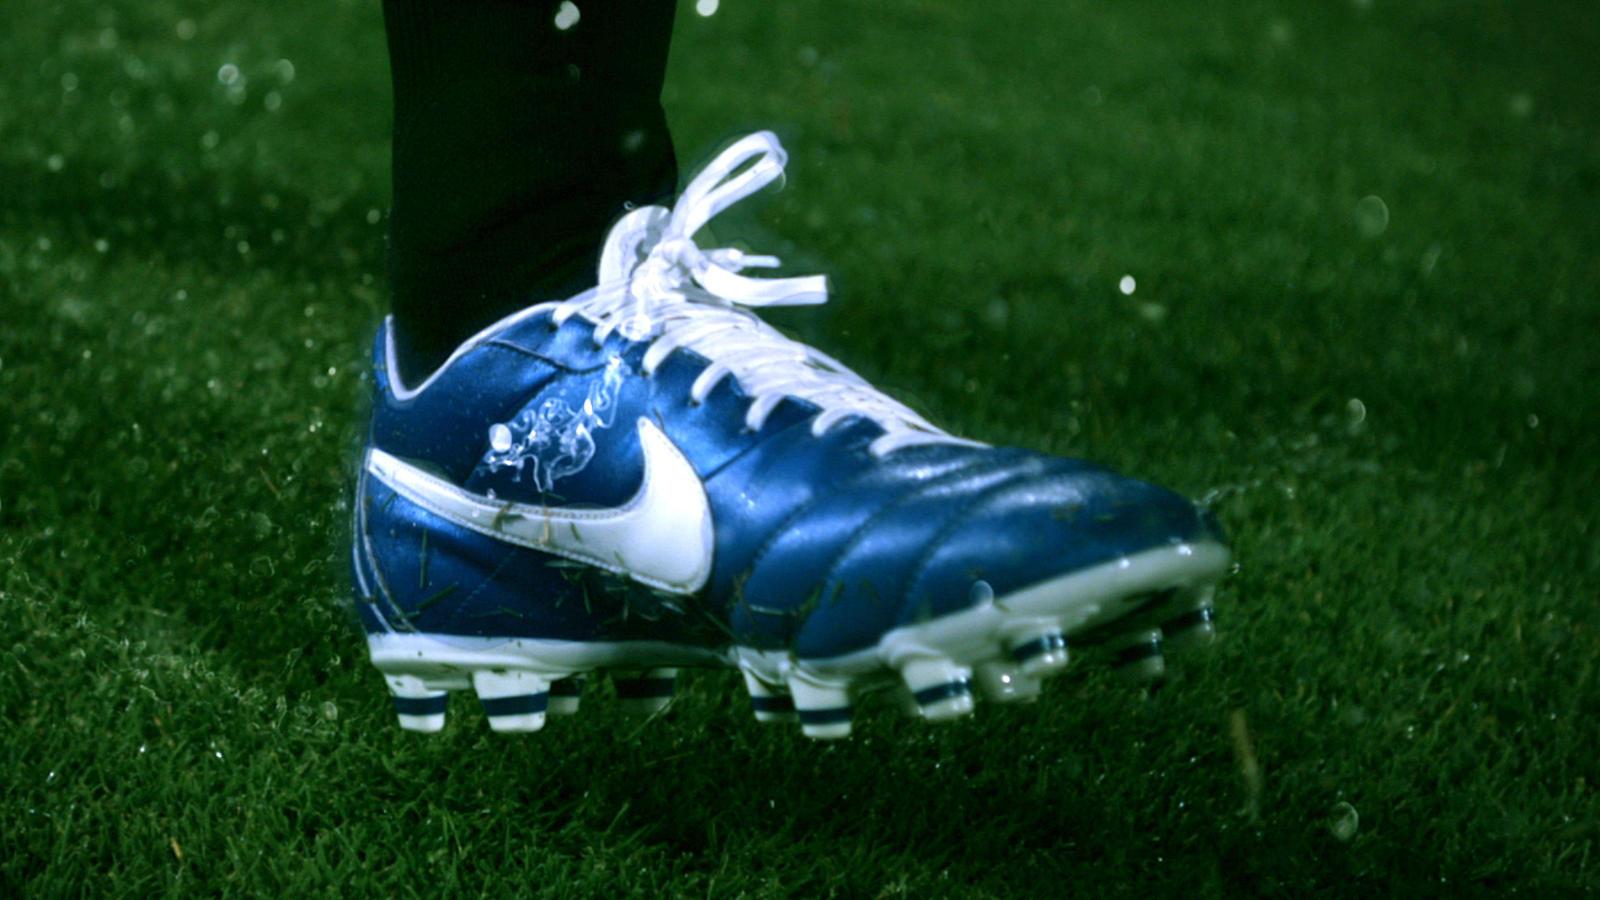 Technology across football boots - Nike